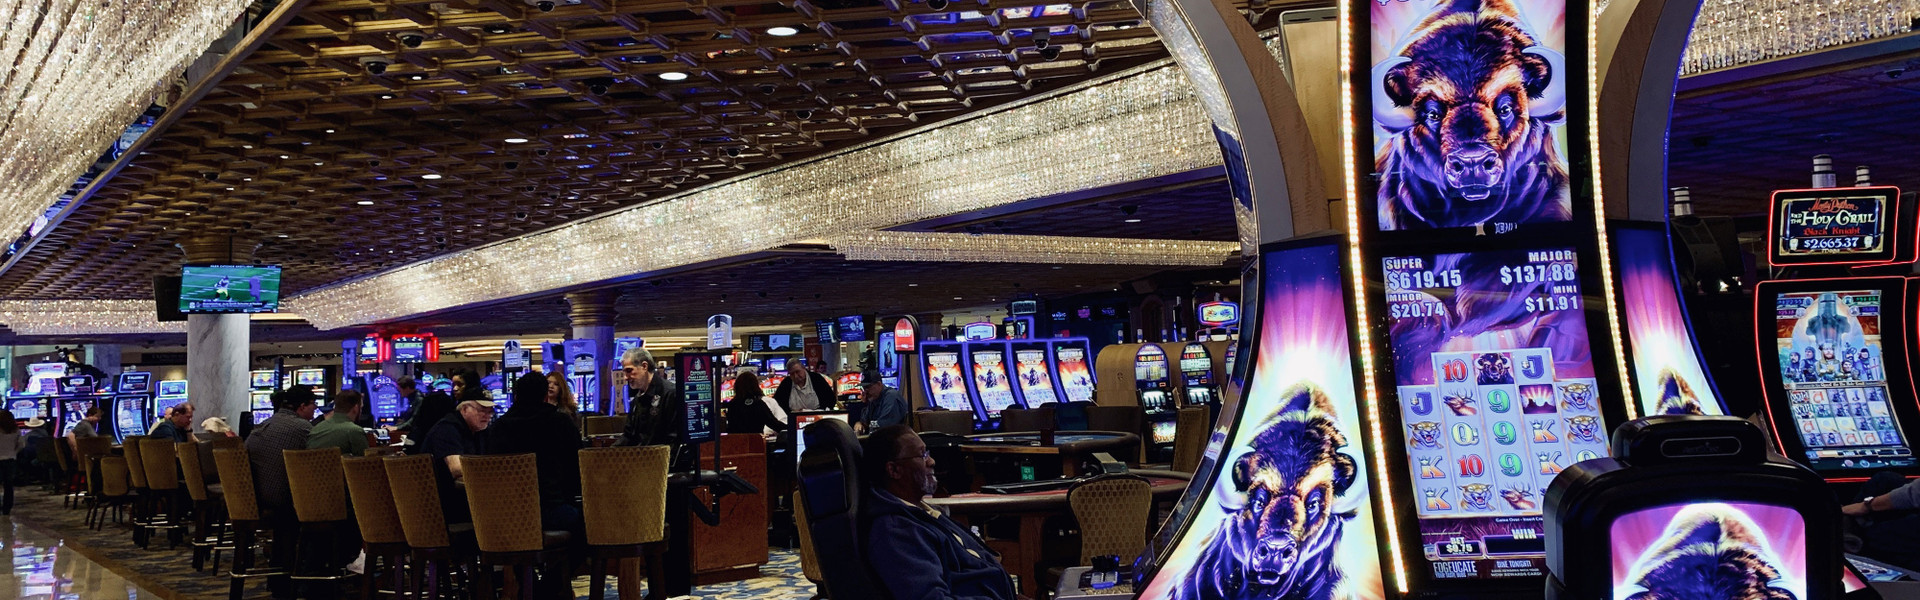 Win Big at the Sir Winston Westgate $25,000 Slot Tournament June 7-8, 2019 at the Westgate Las Vegas Resort & Casino